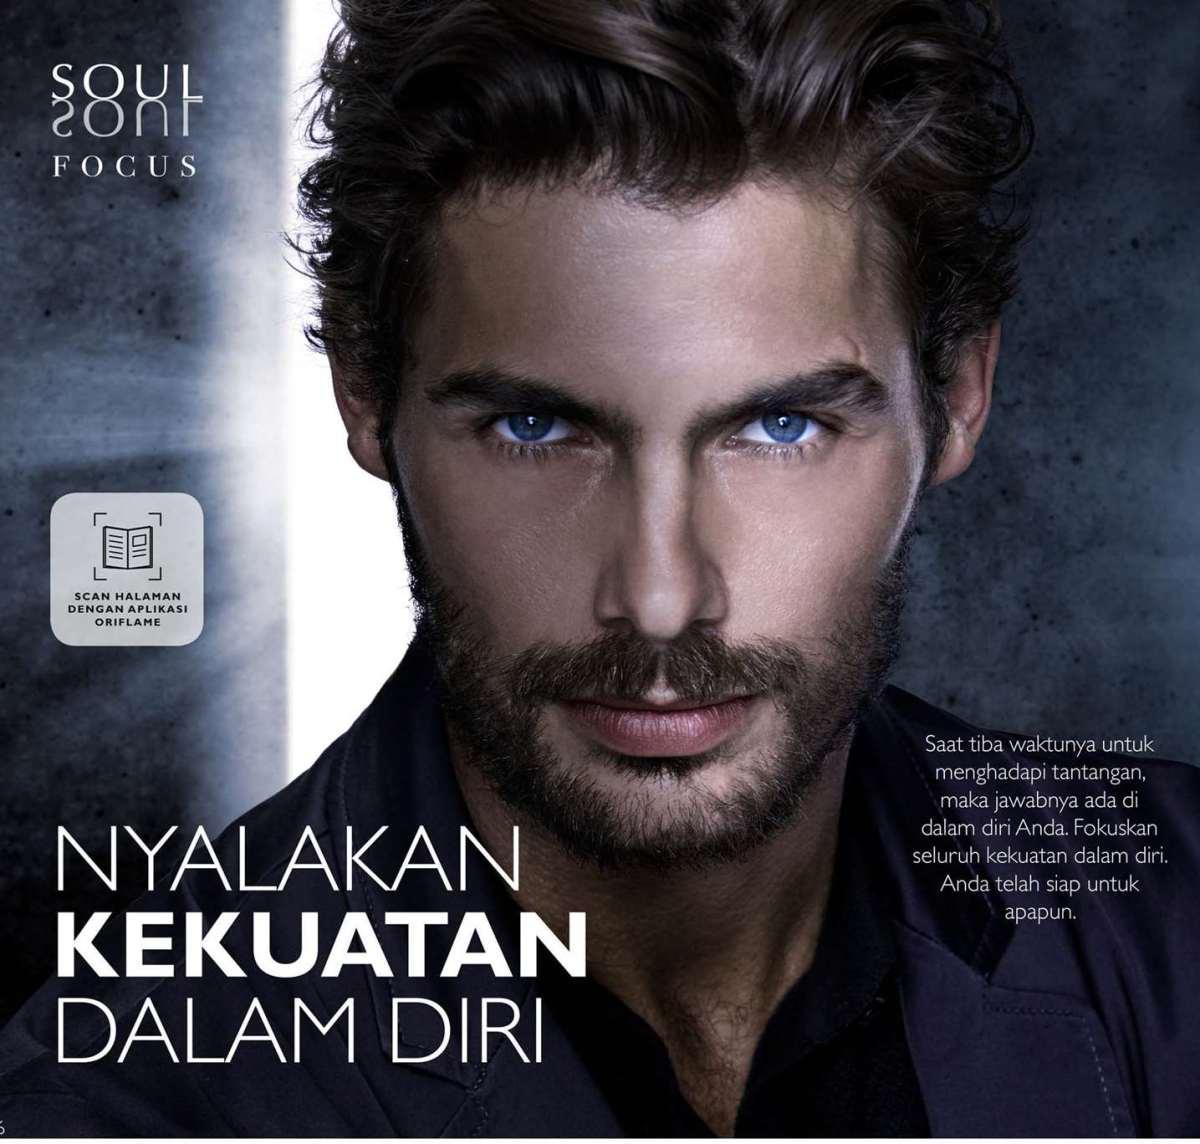 Katalog Oriflame Desember 2019 Hal 036